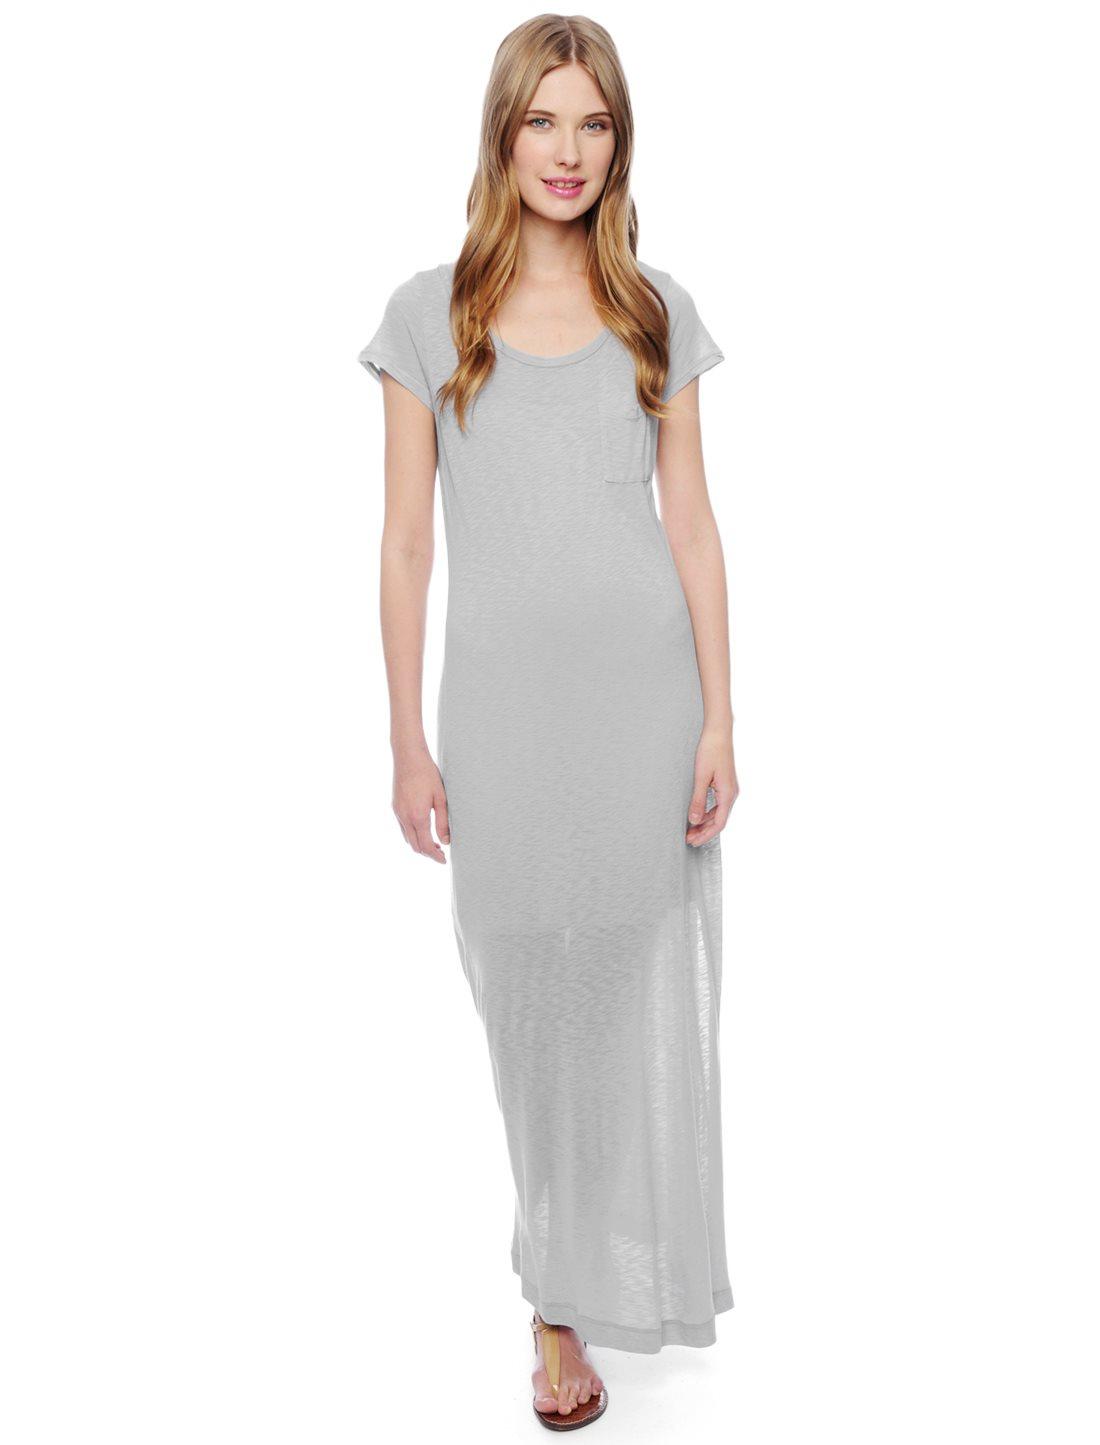 Splendid u neck maxi dress embellished